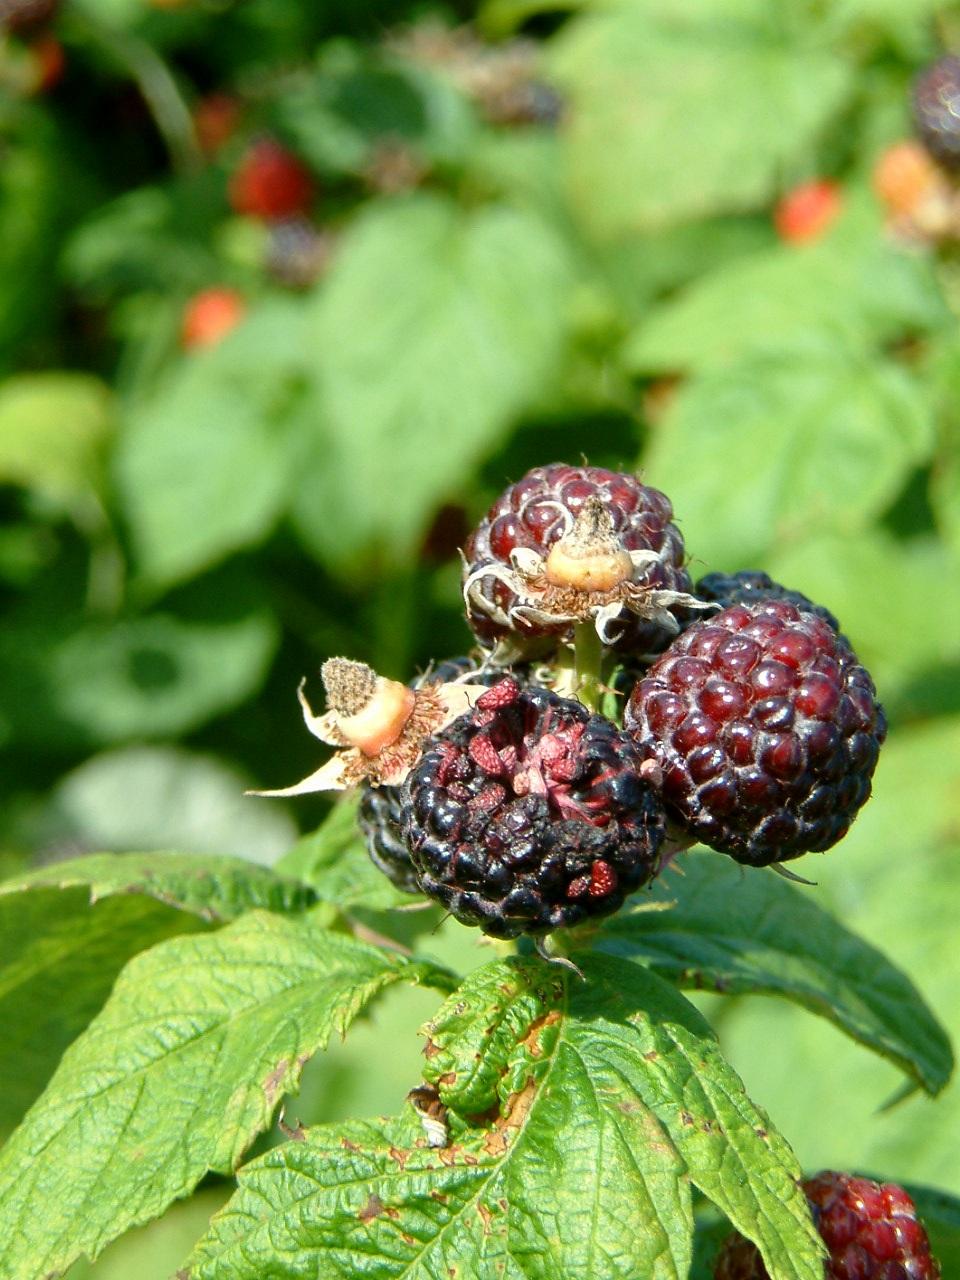 Bird damage in black raspberries.